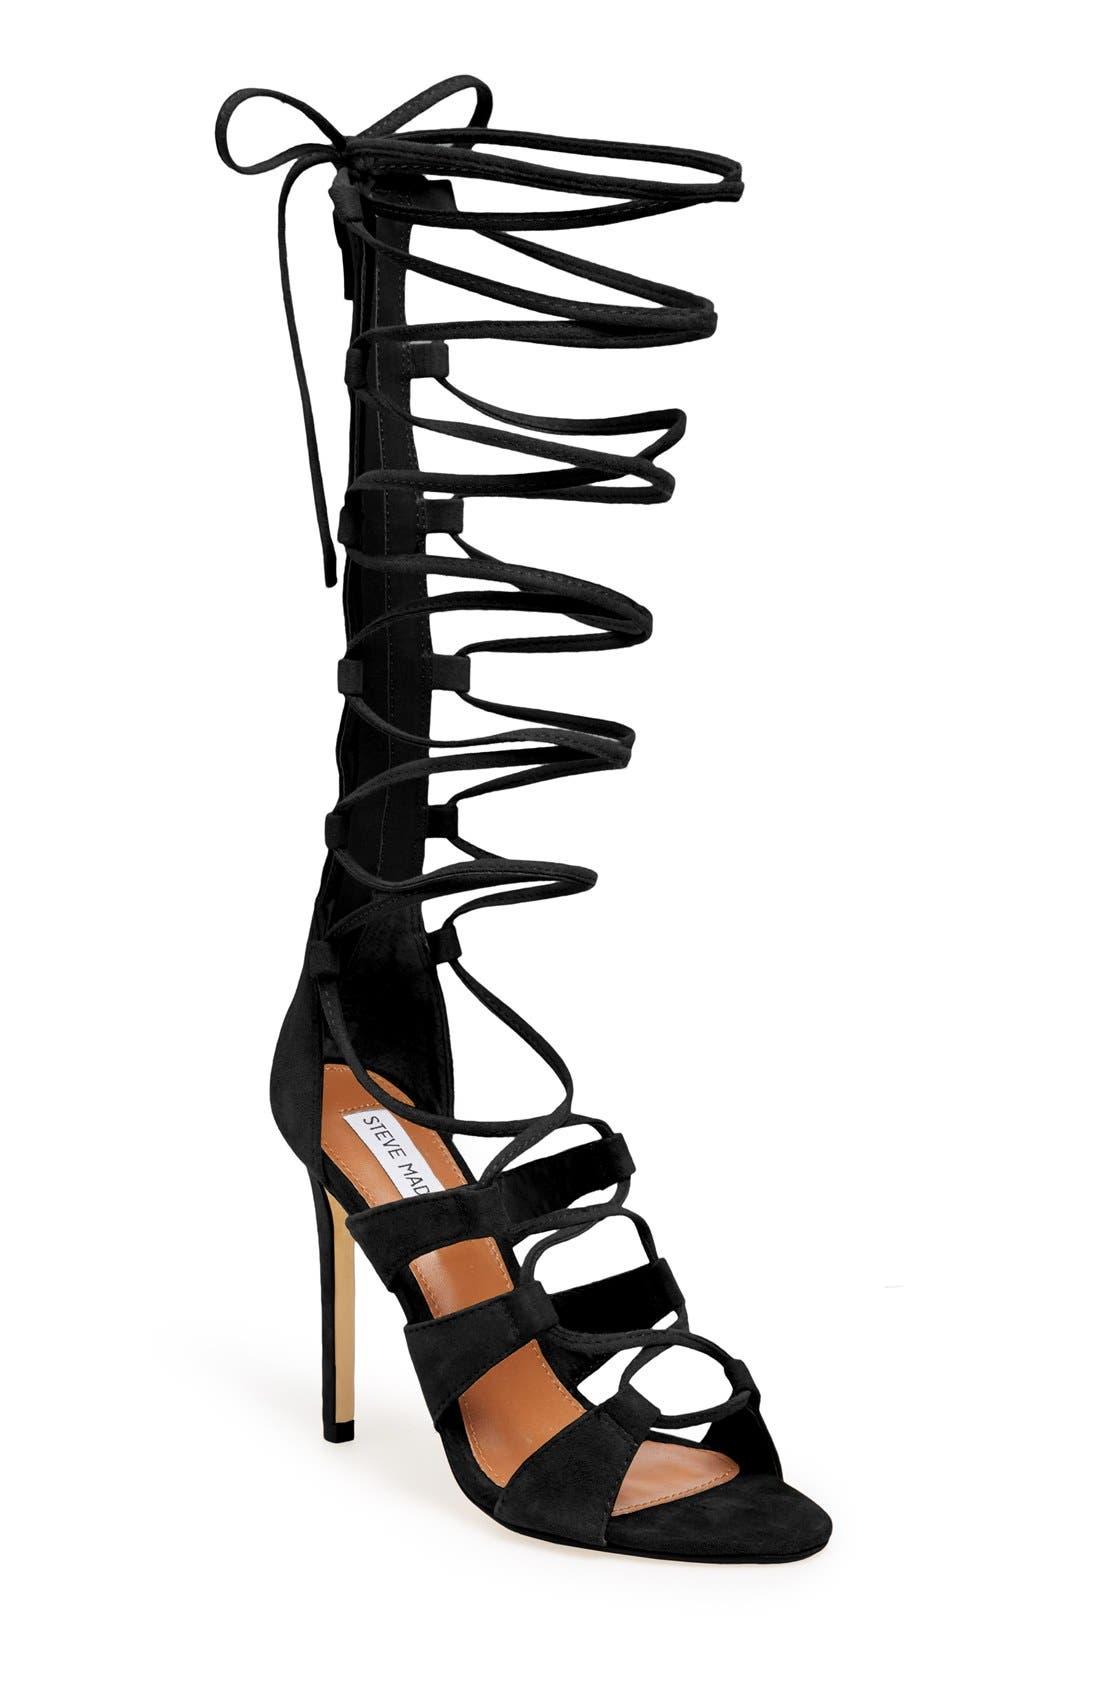 Main Image - Steve Madden 'Faroh' Lace-Up Sandal (Women)